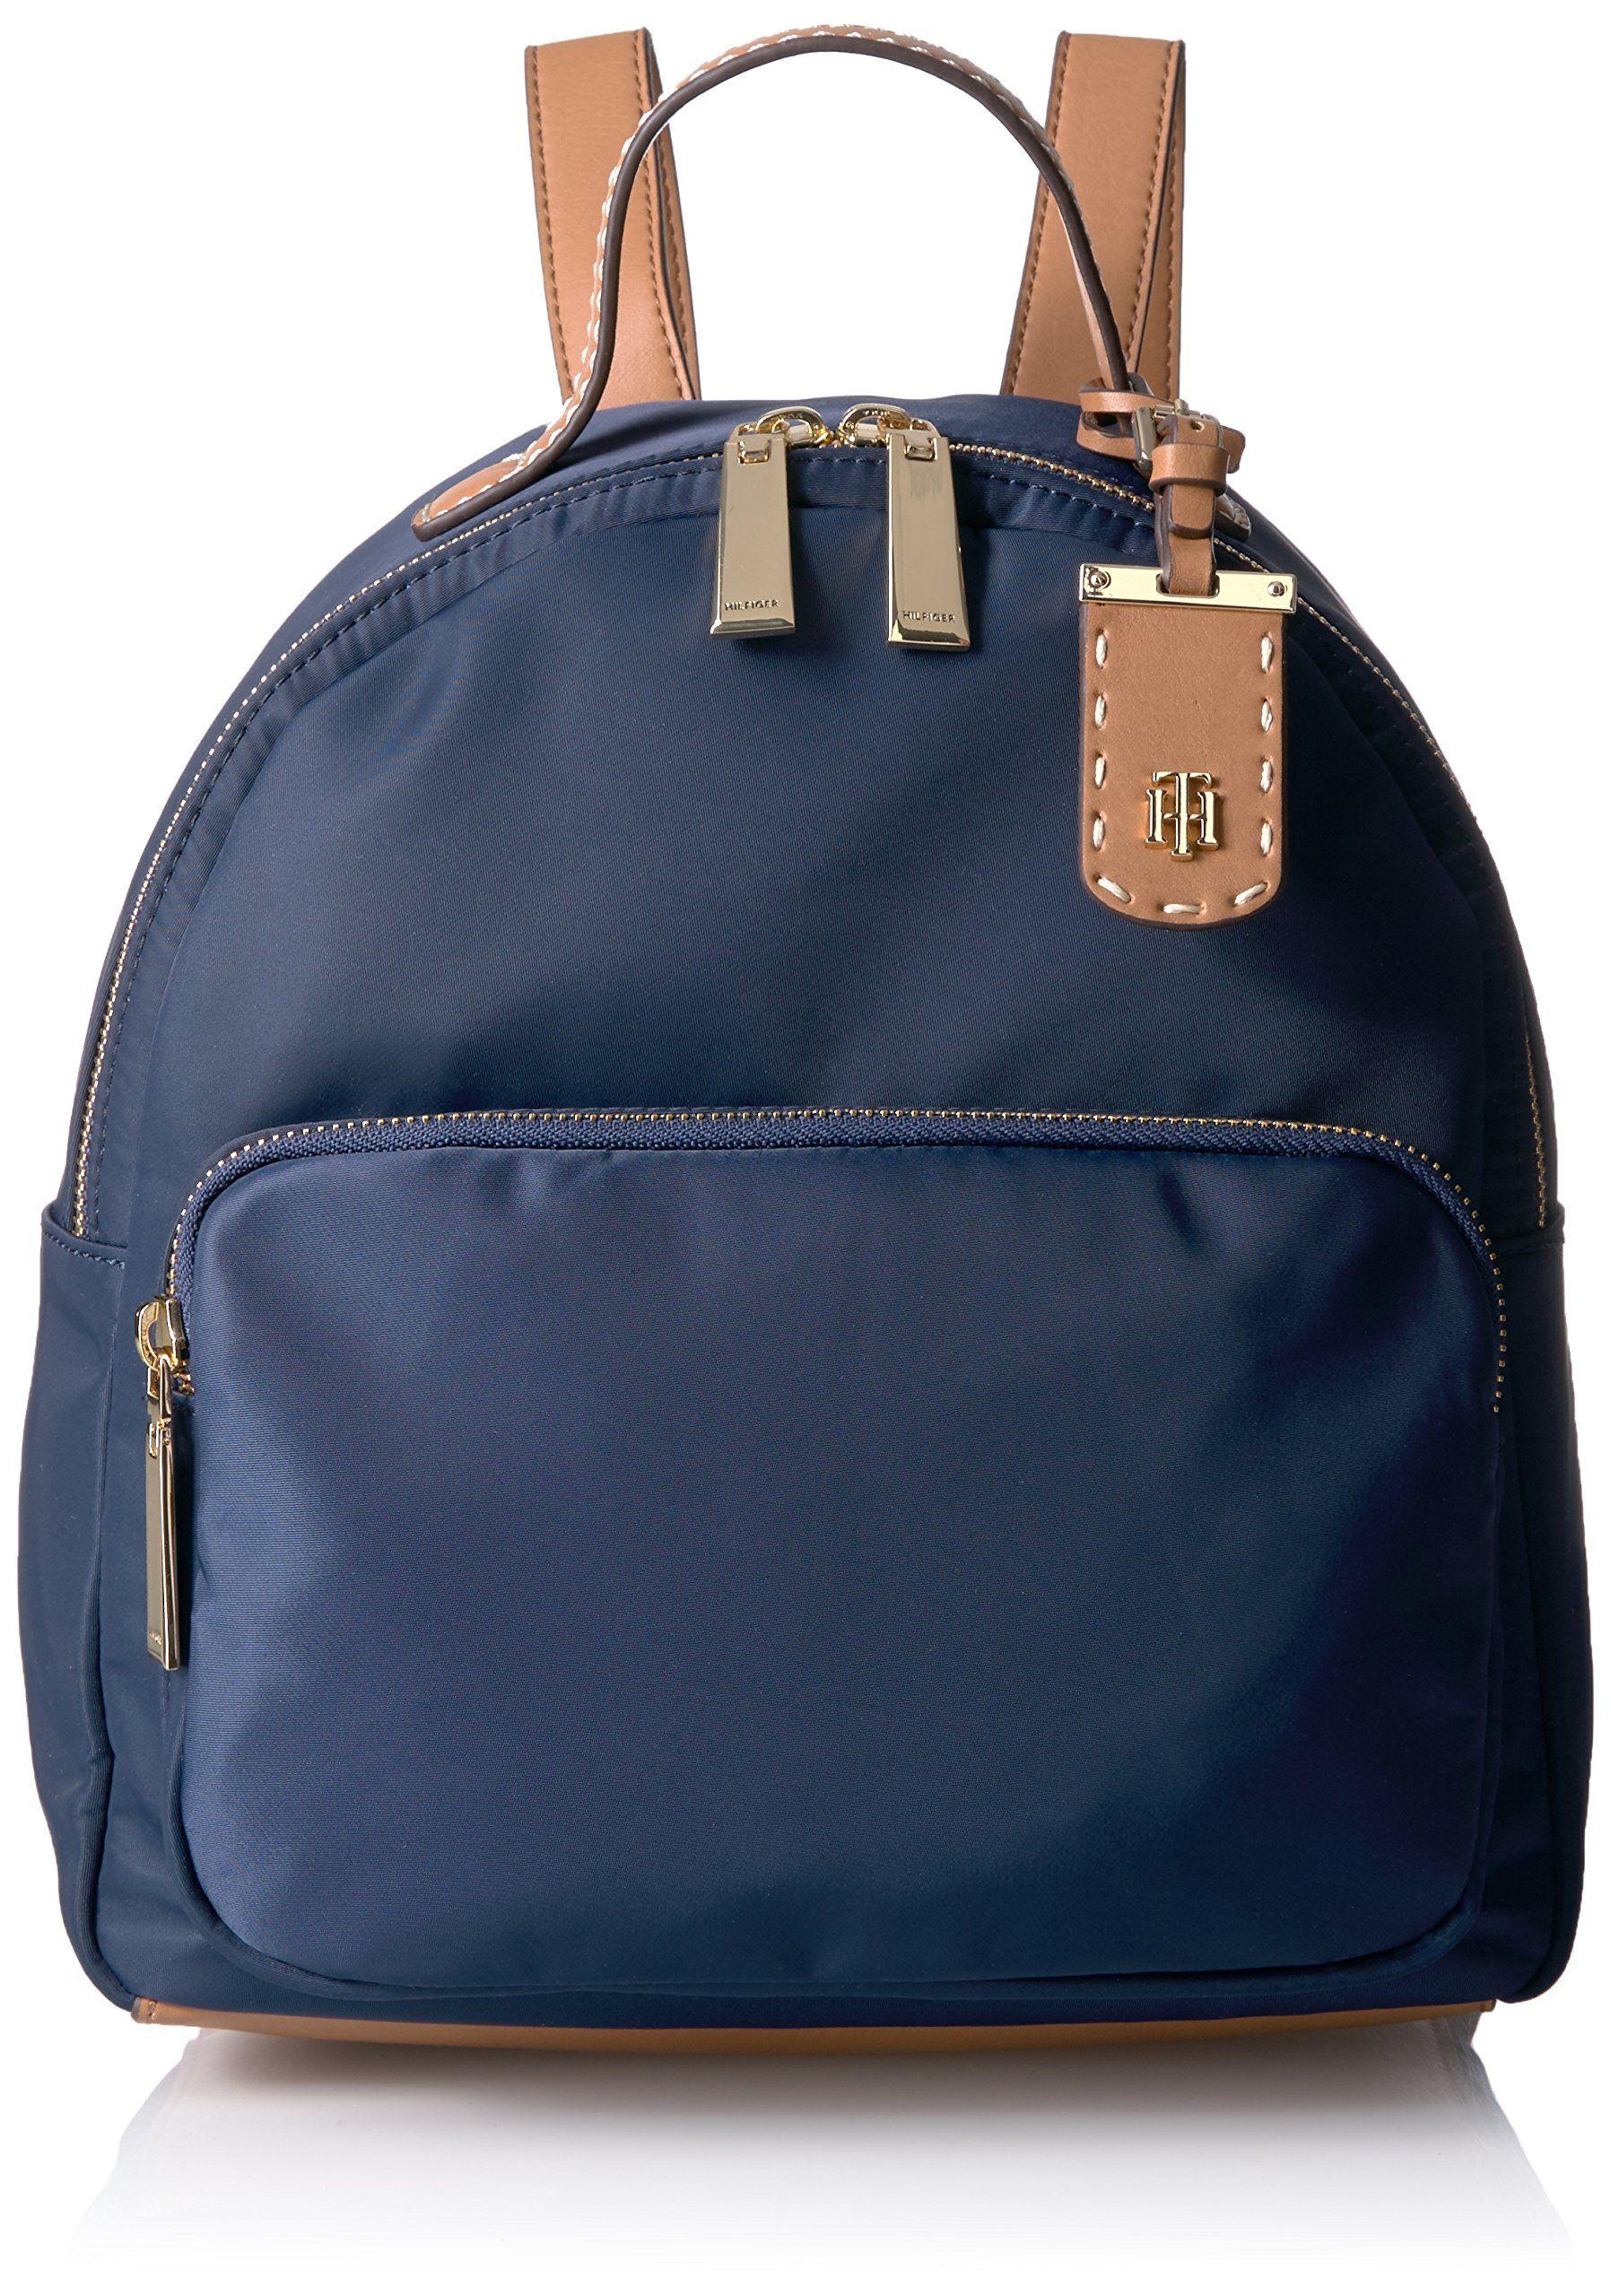 45e021b8e4e5b Tommy Hilfiger Women s Julia Dome Backpack